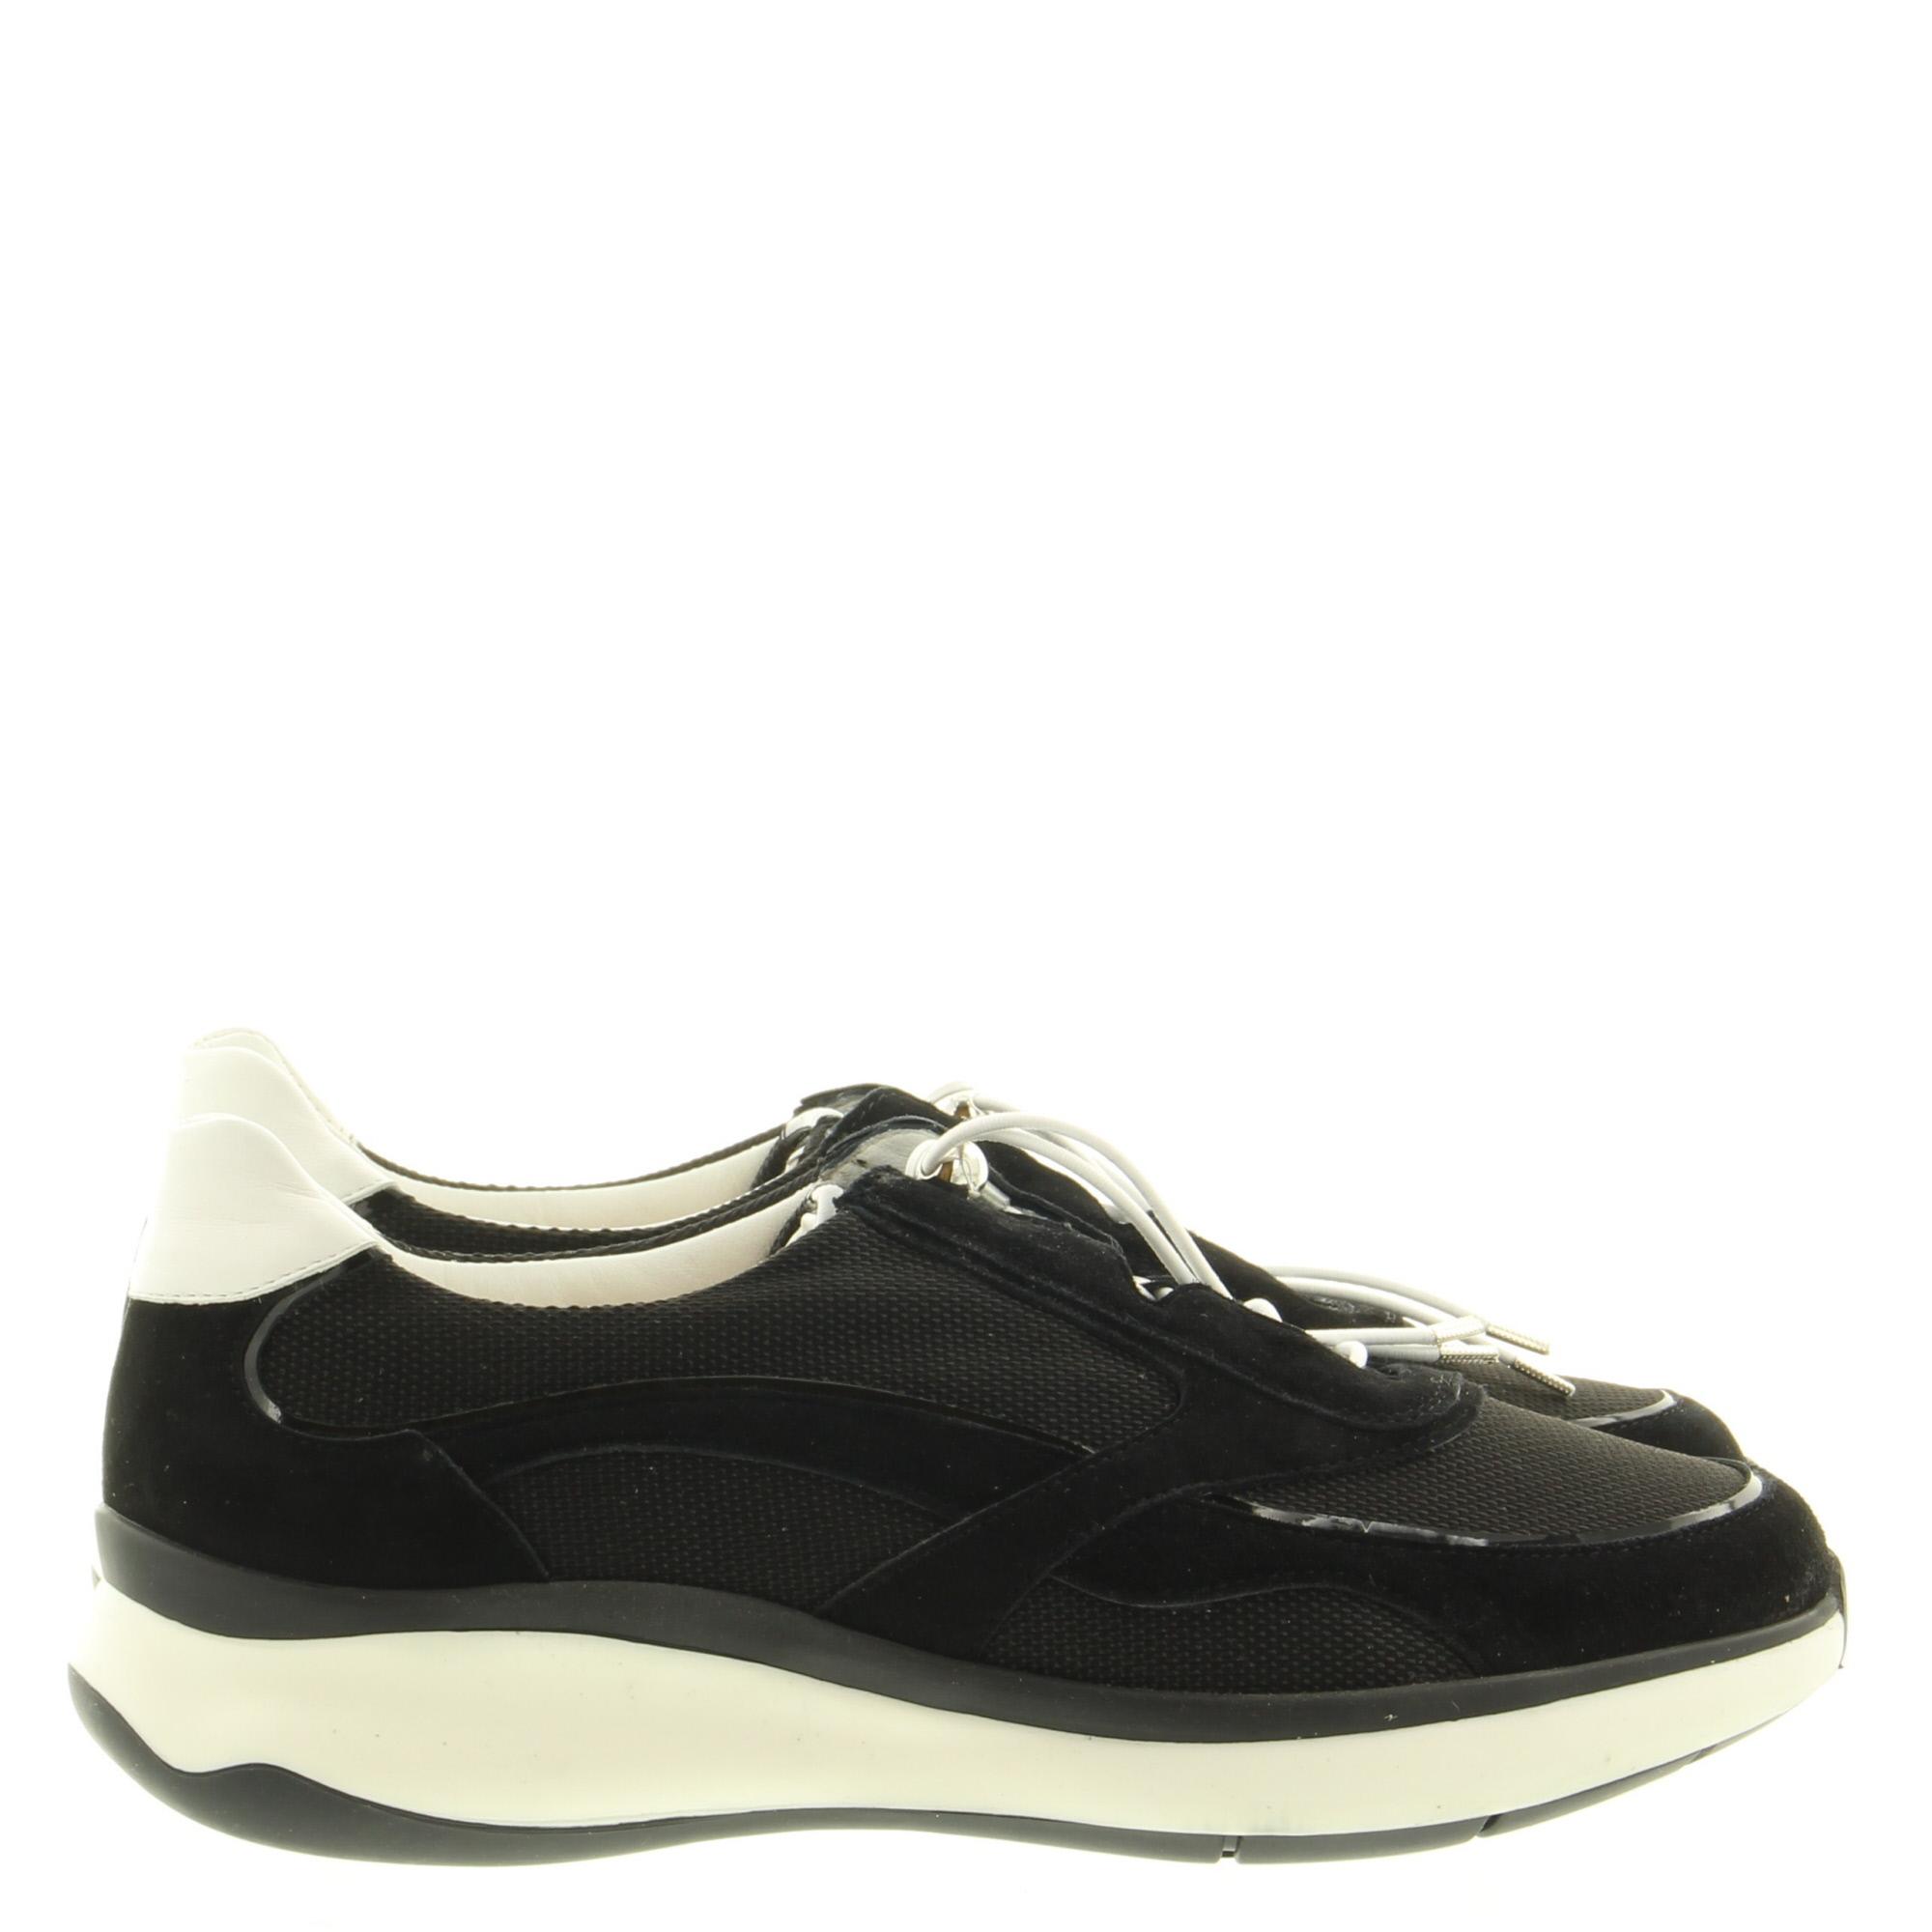 Hassia Shoes 301173 Monaco 0106 Schwarz Milk